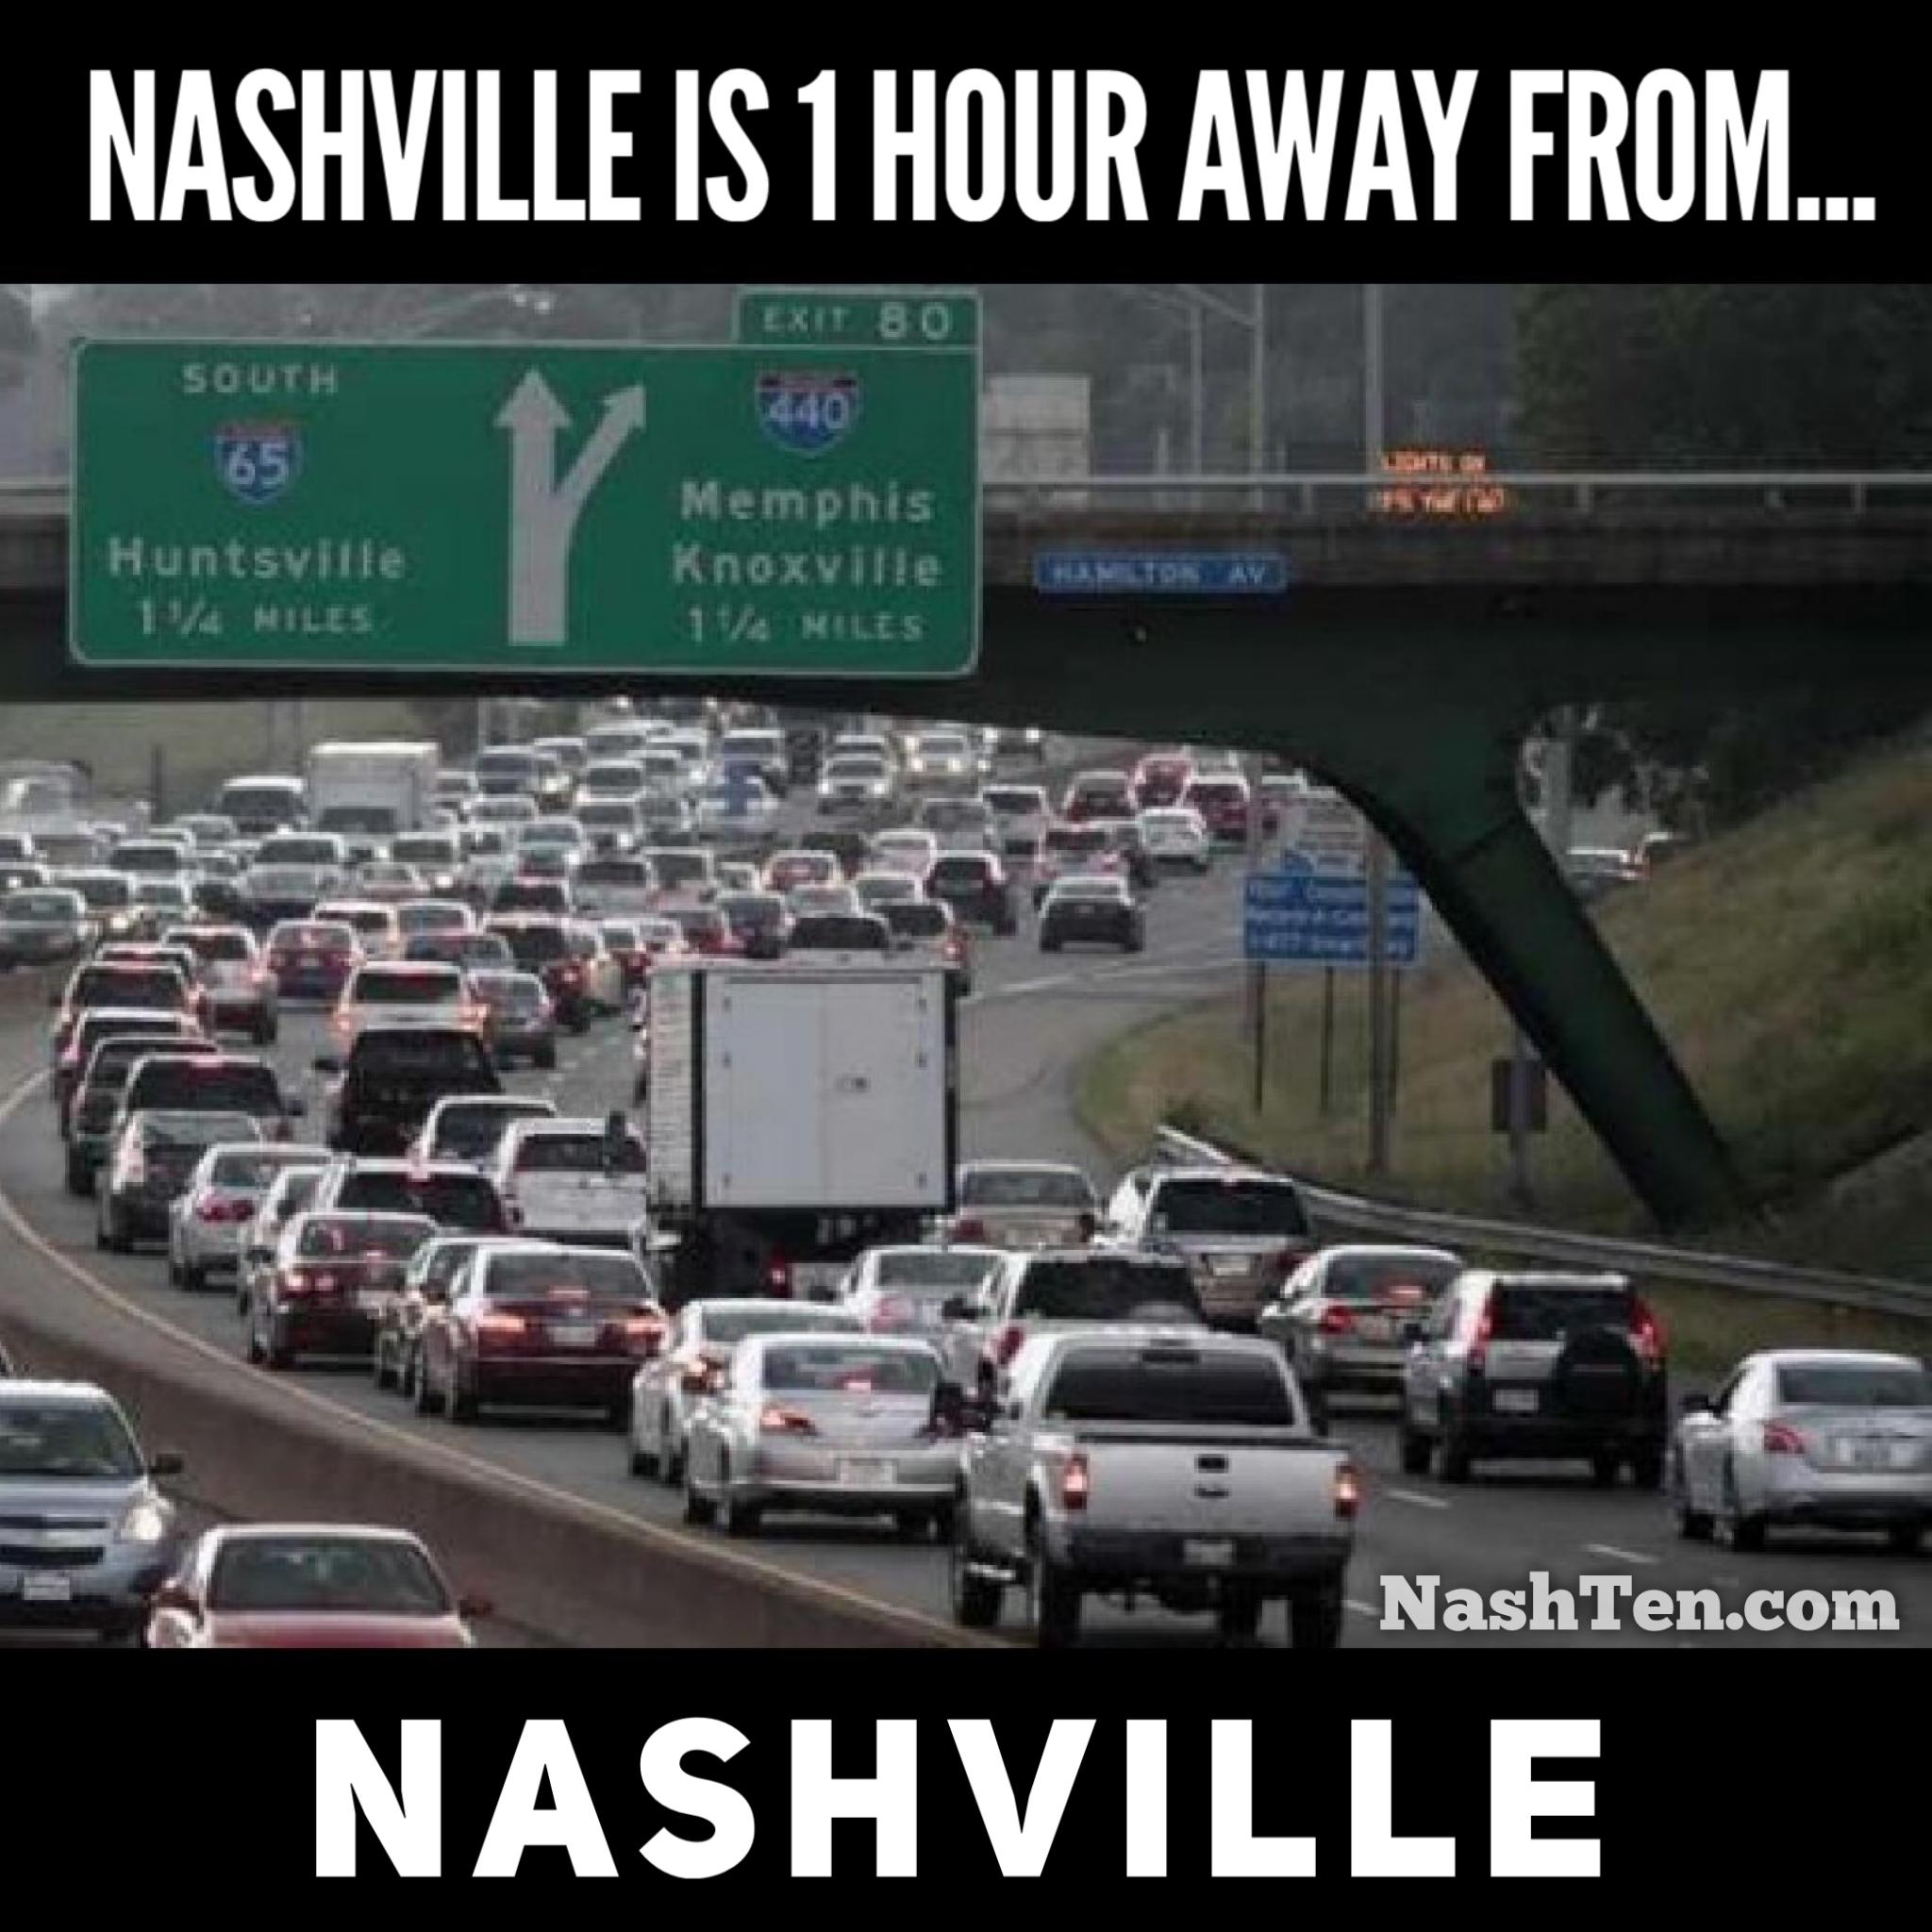 Nashville is 1 hour away from Nashville